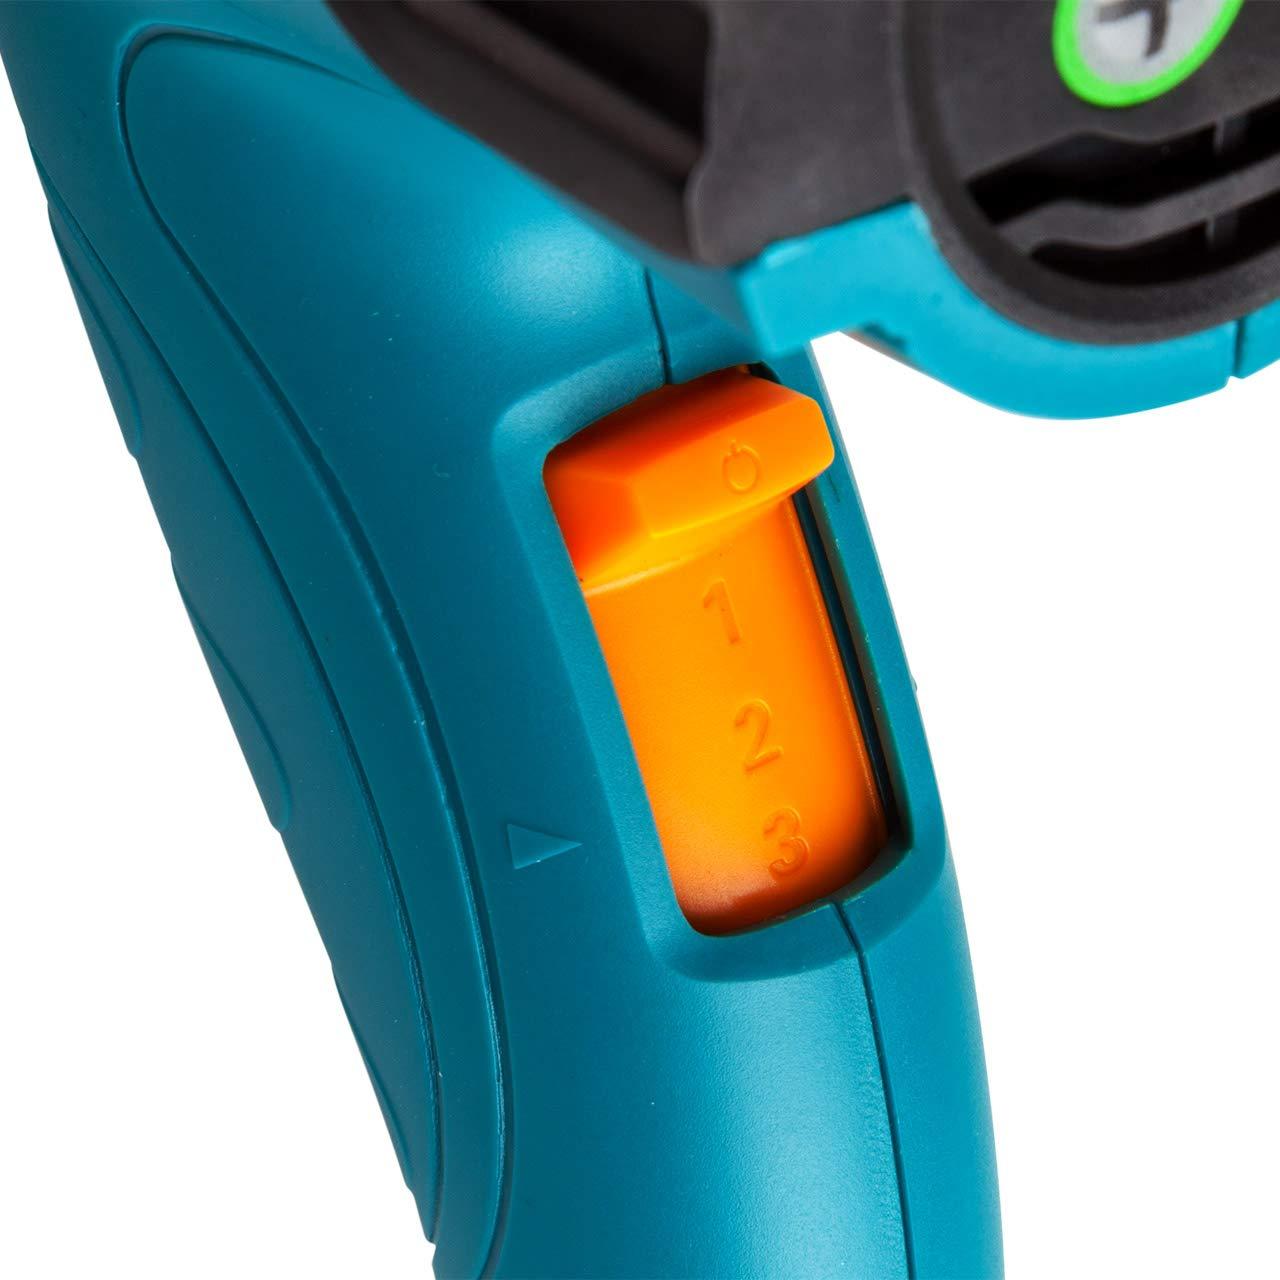 2000 Watt 60 /°C // 80-350 /°C // 80-600 /°C 3 Heizstufen Heissluftgebl/äse Bort BHG-2000N-LK mit LCD Display